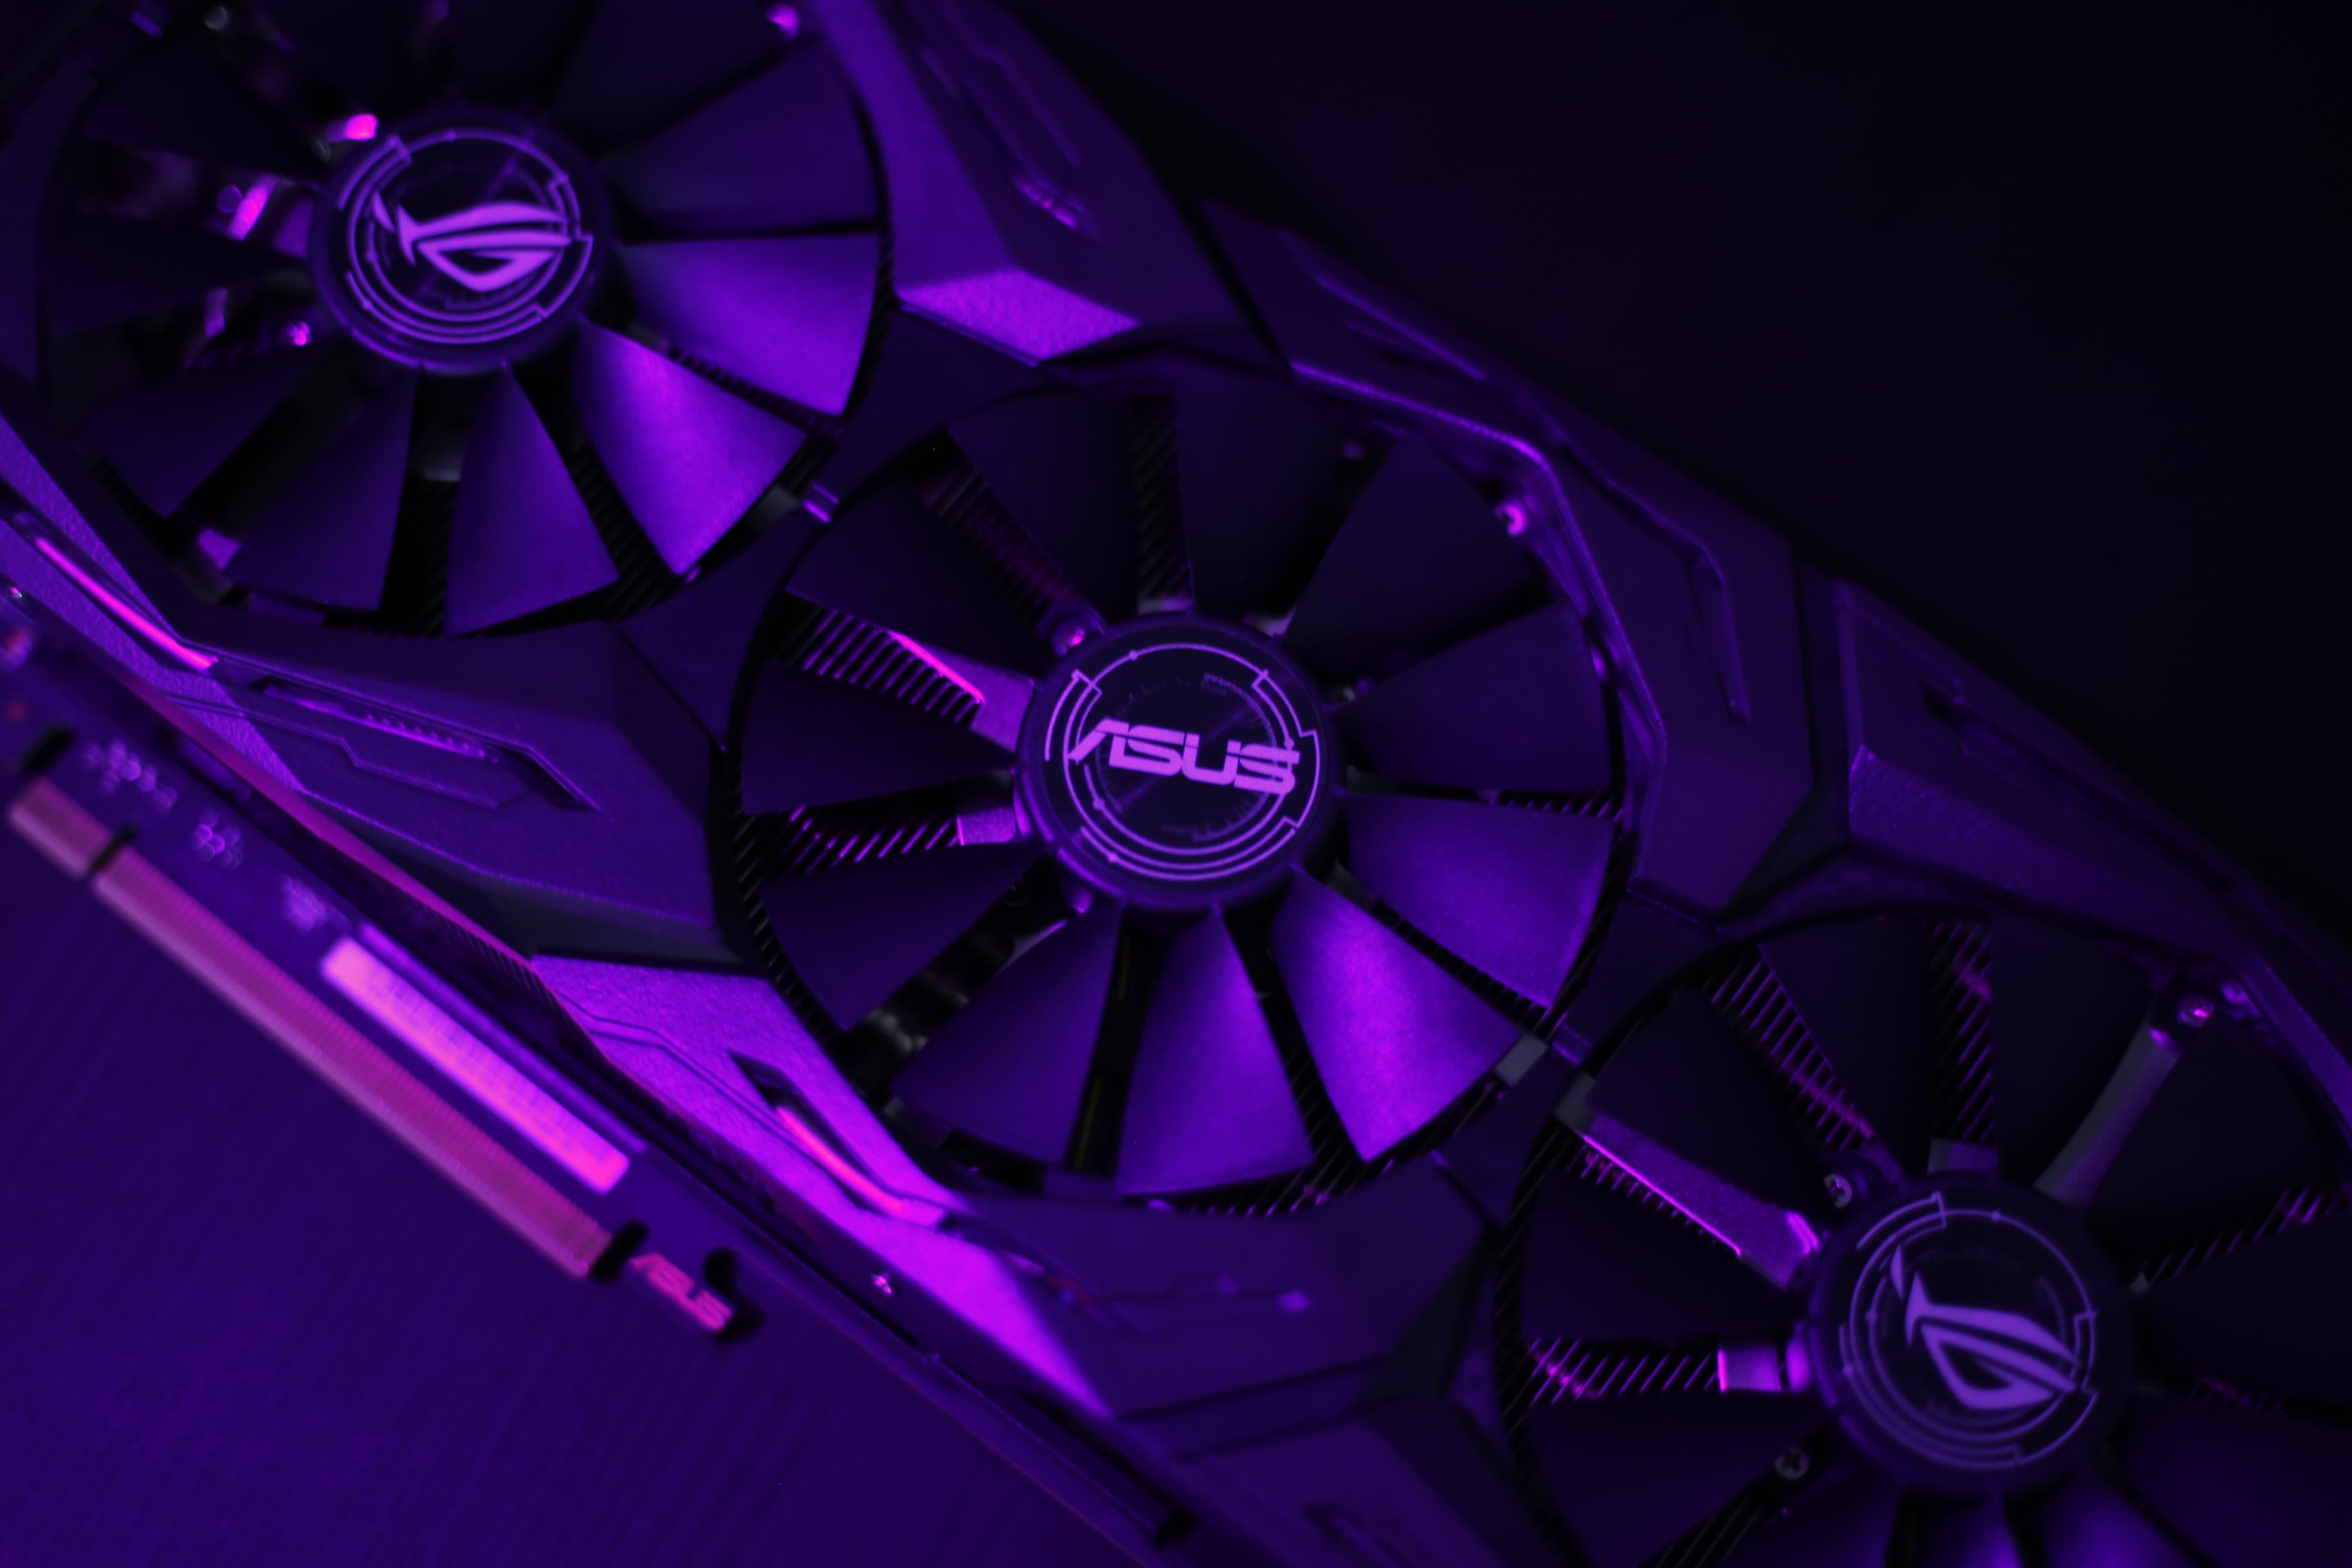 ASUS ROG STRIX GTX 1080 Ti OC